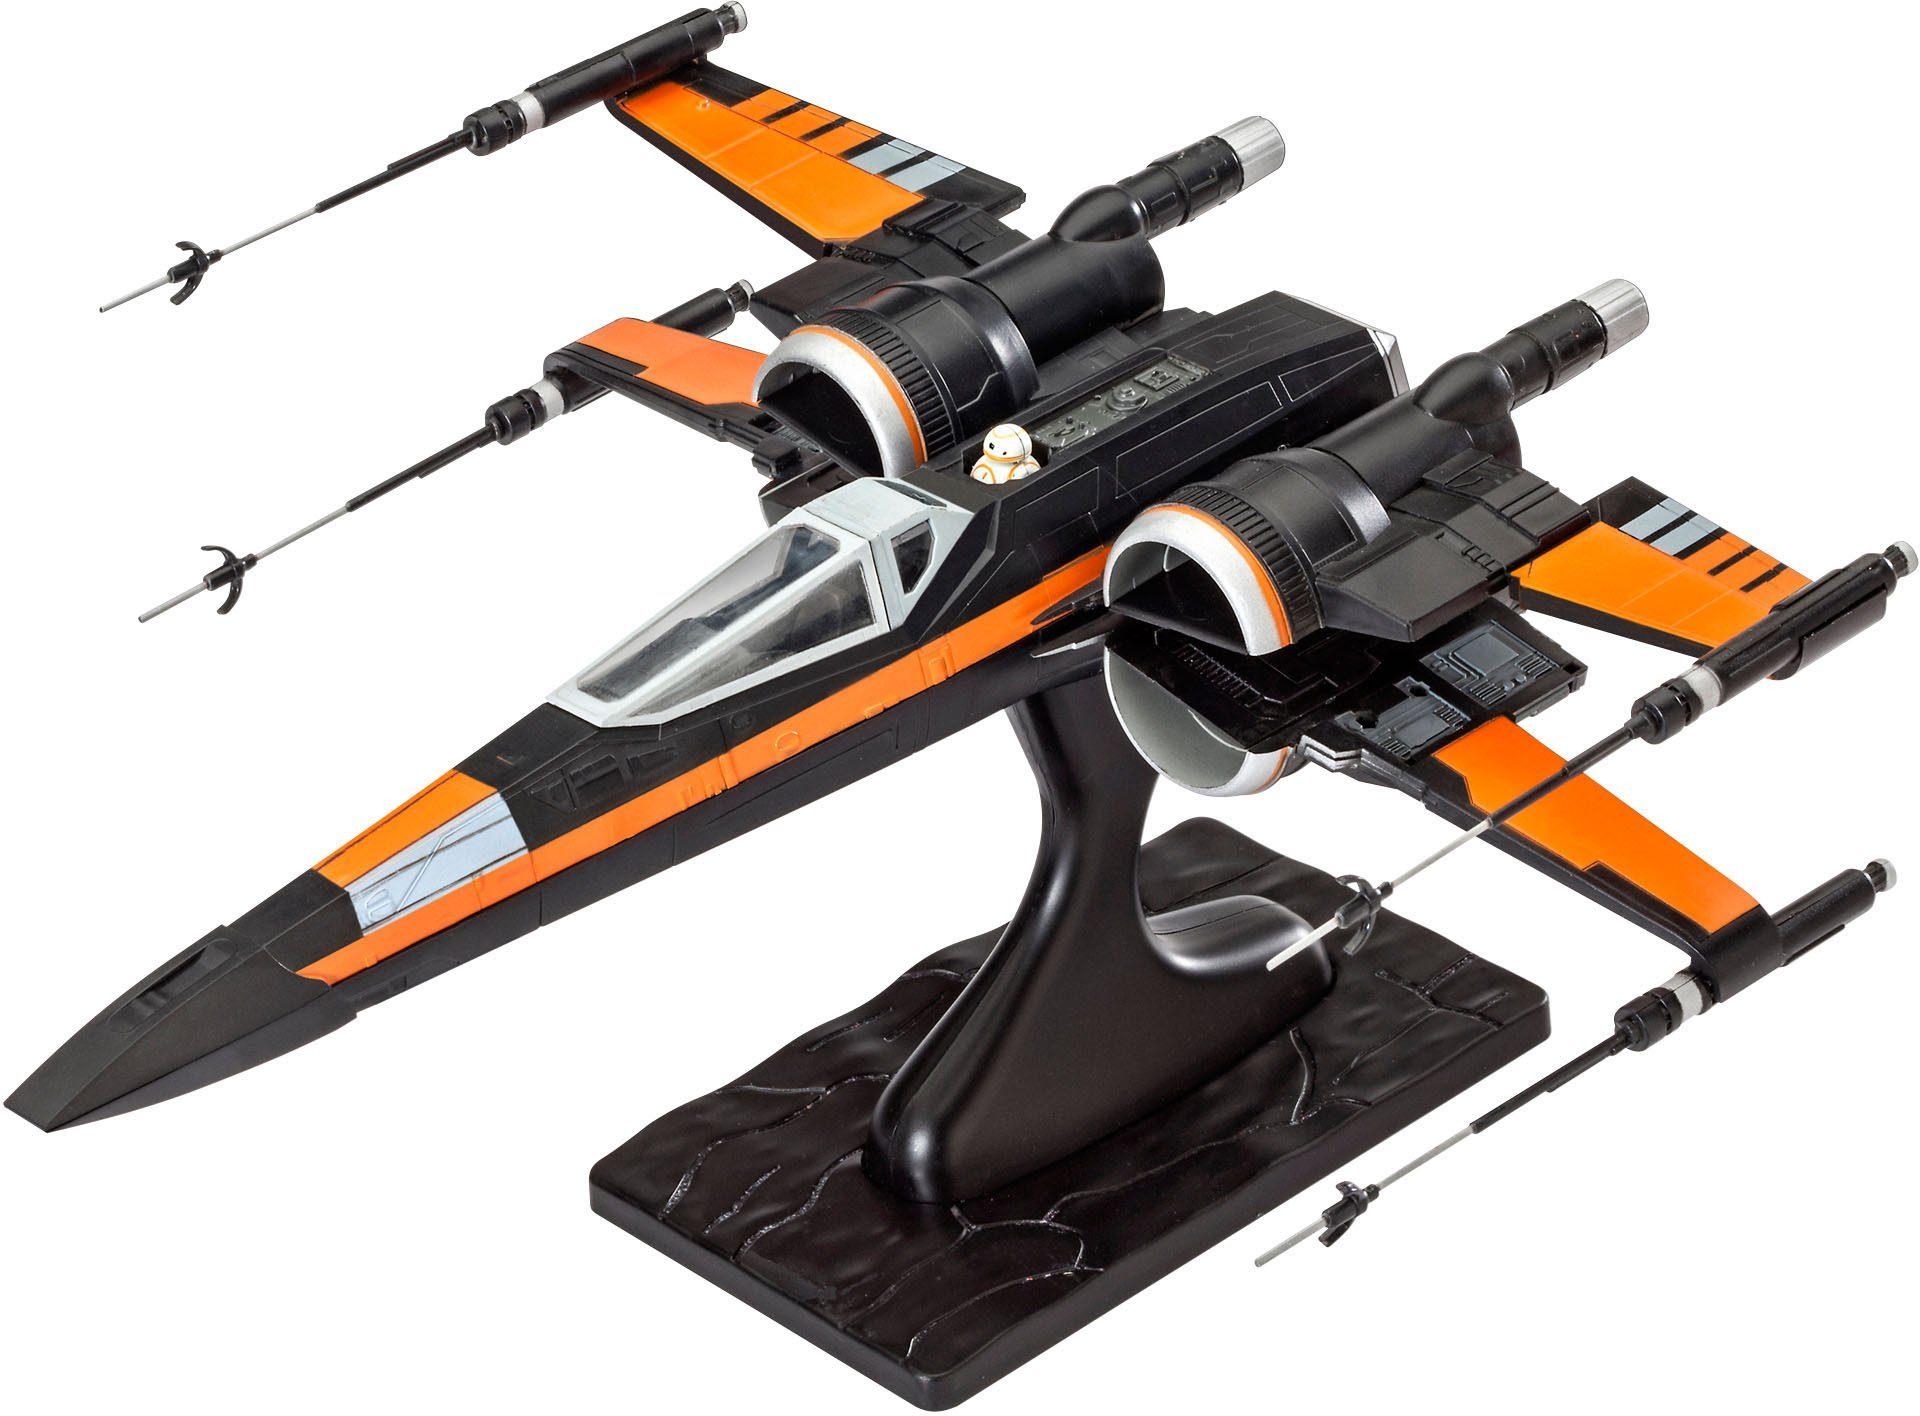 Revell® Modellbausatz Raumgleiter, Maßstab 1:50, »Disney Star Wars Poe's Xwing Fighter™«